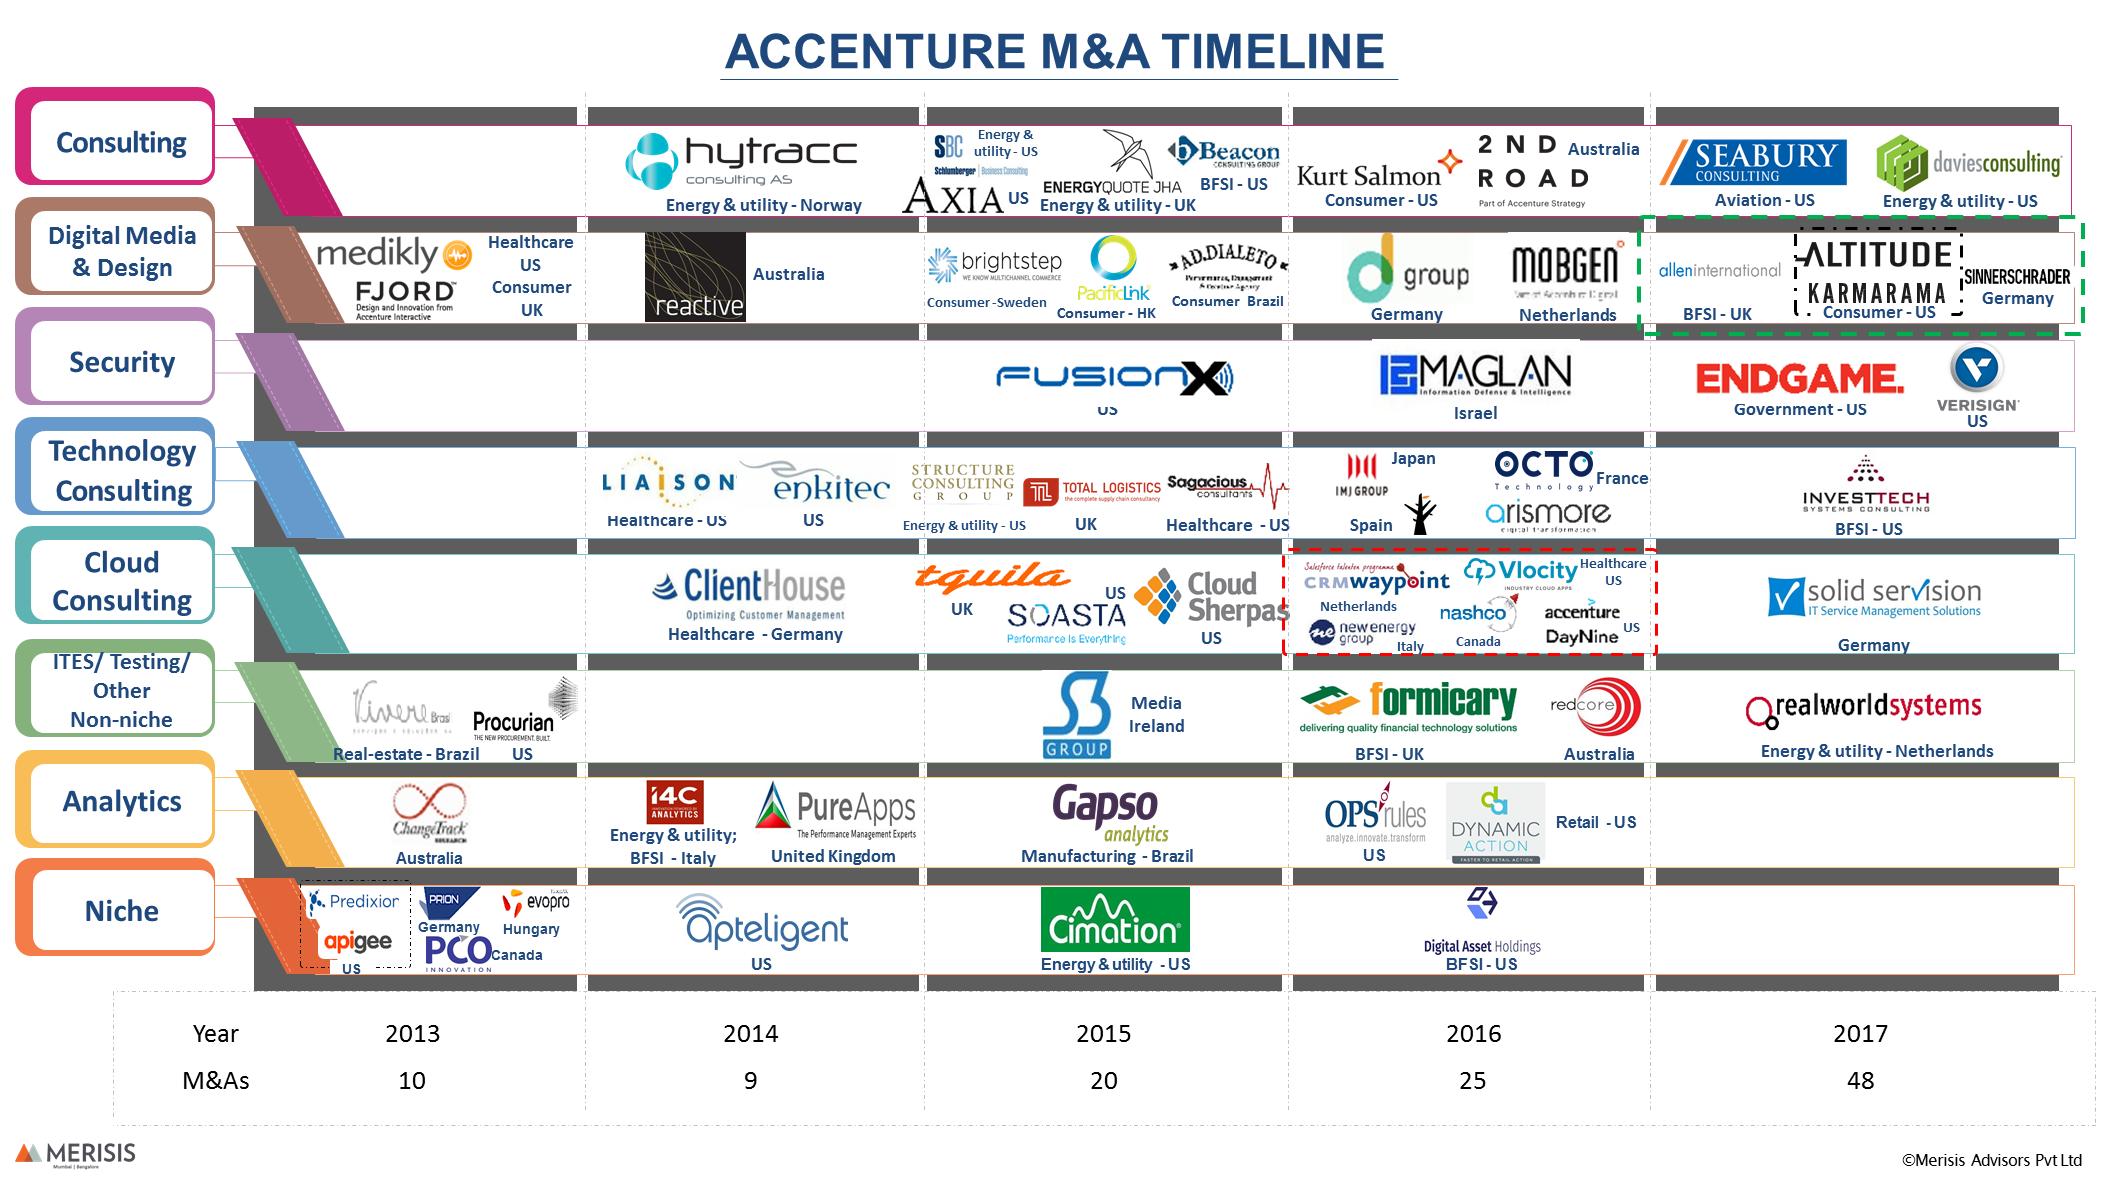 Accenture M&A Timeline